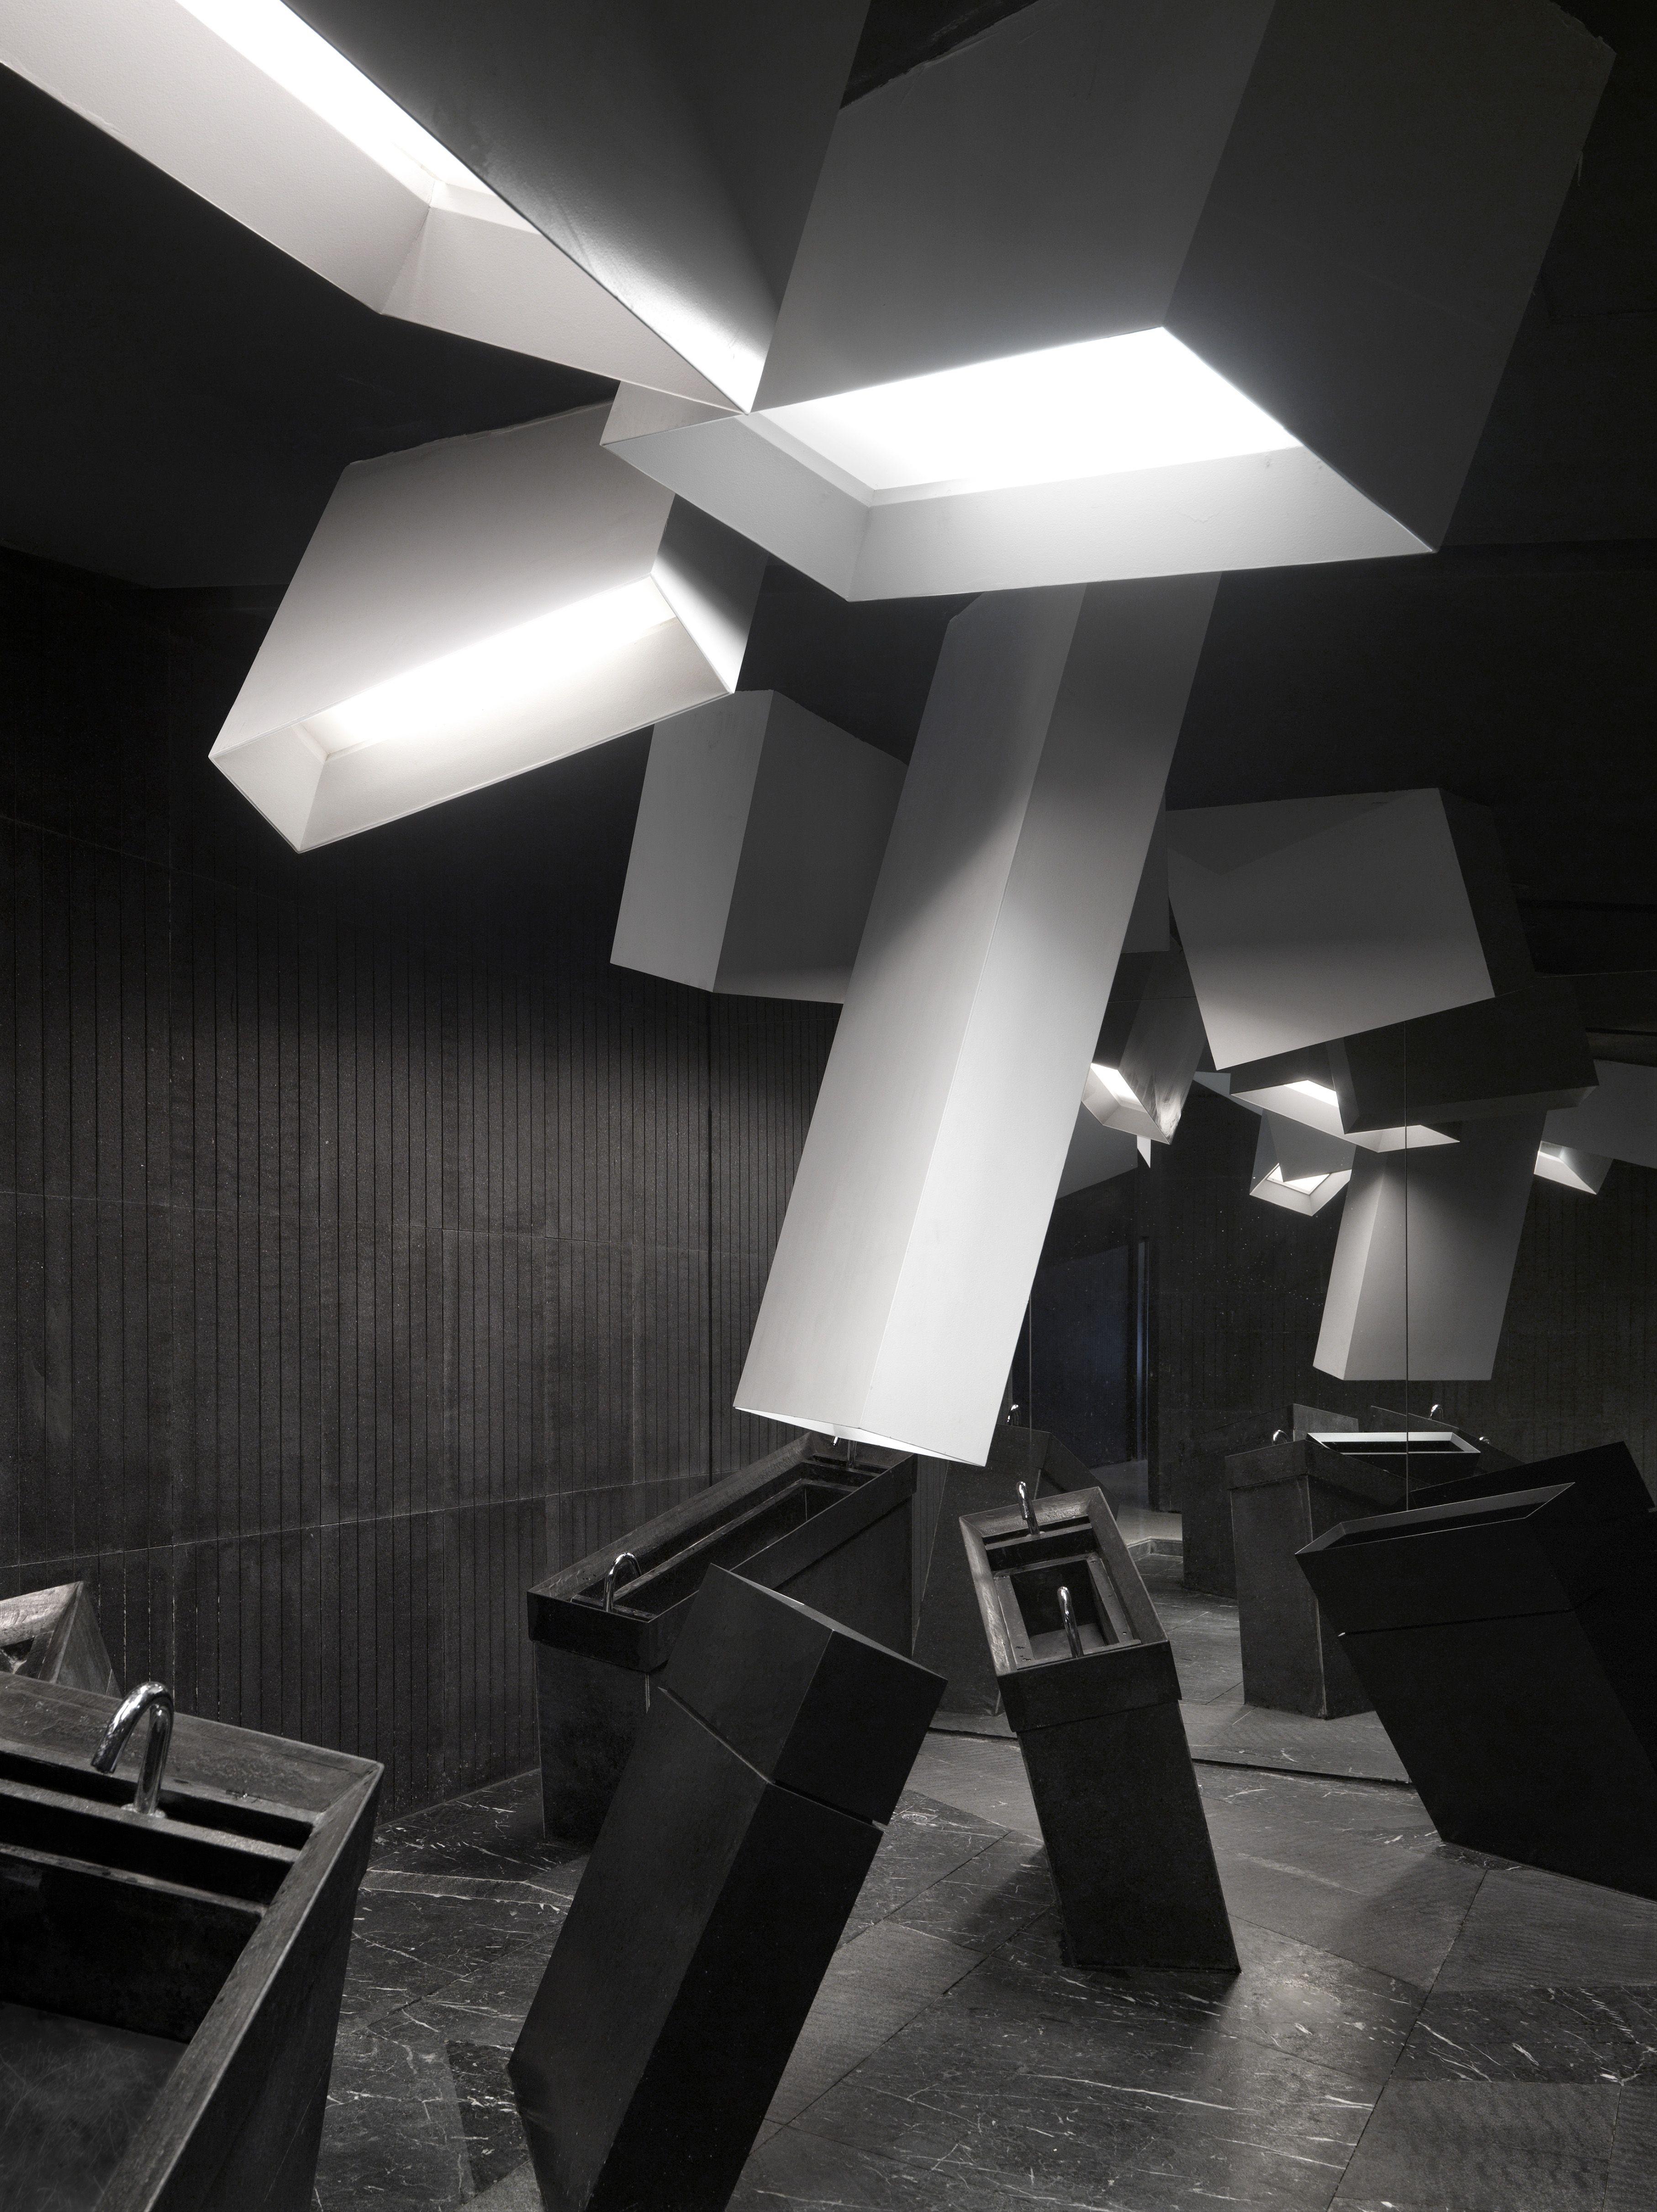 Pin On Wuhan Wushang Mall International Cinema Exploded Cinema